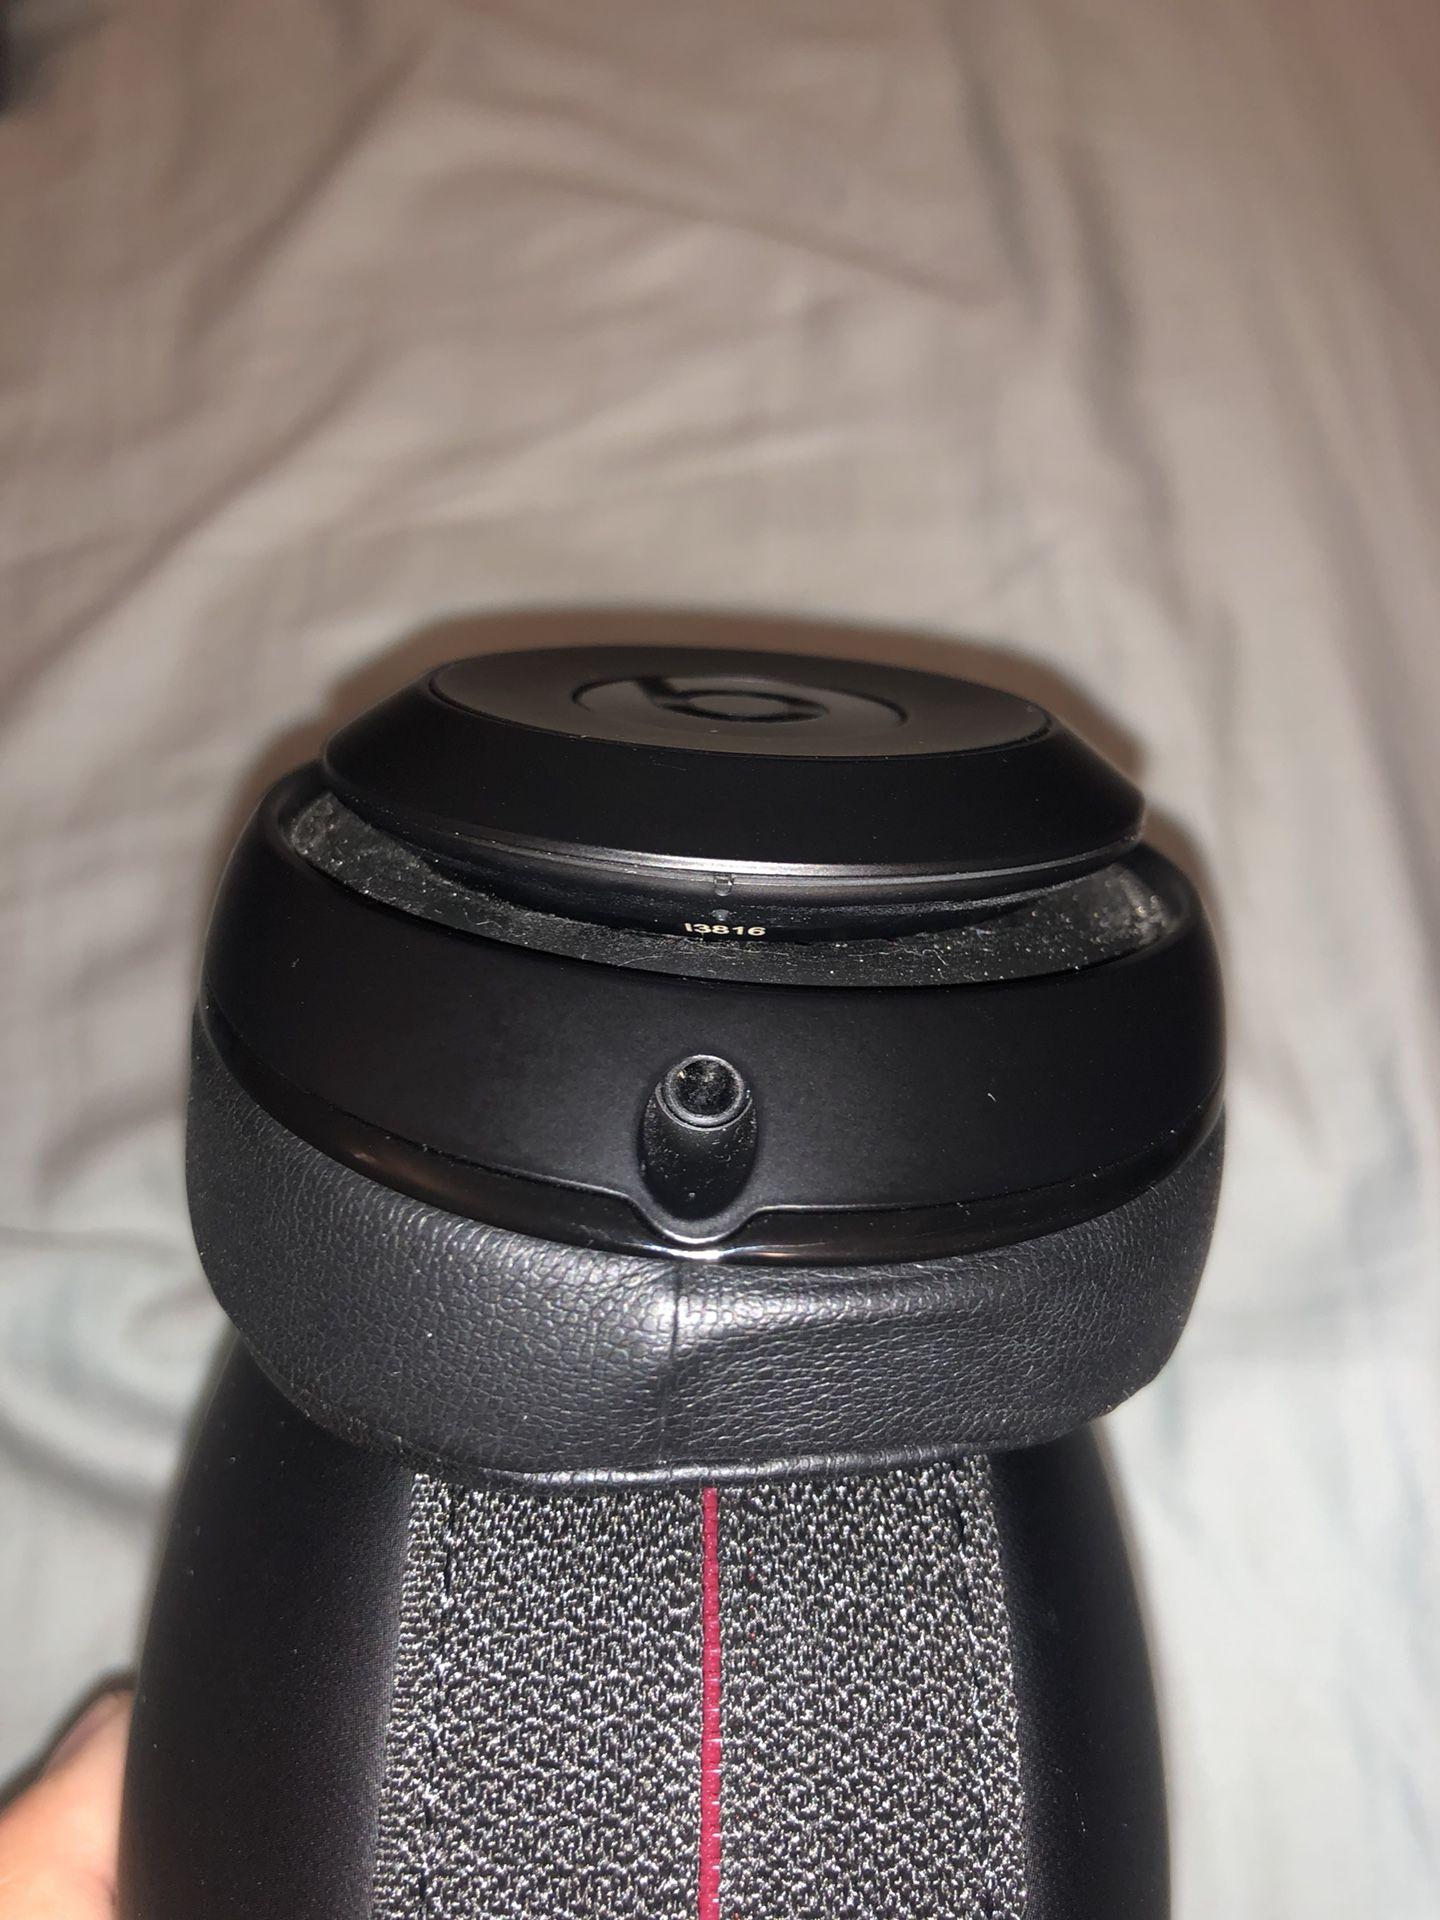 Beats by Dre Studio 2 Wireless Headphones Black Bluetooth